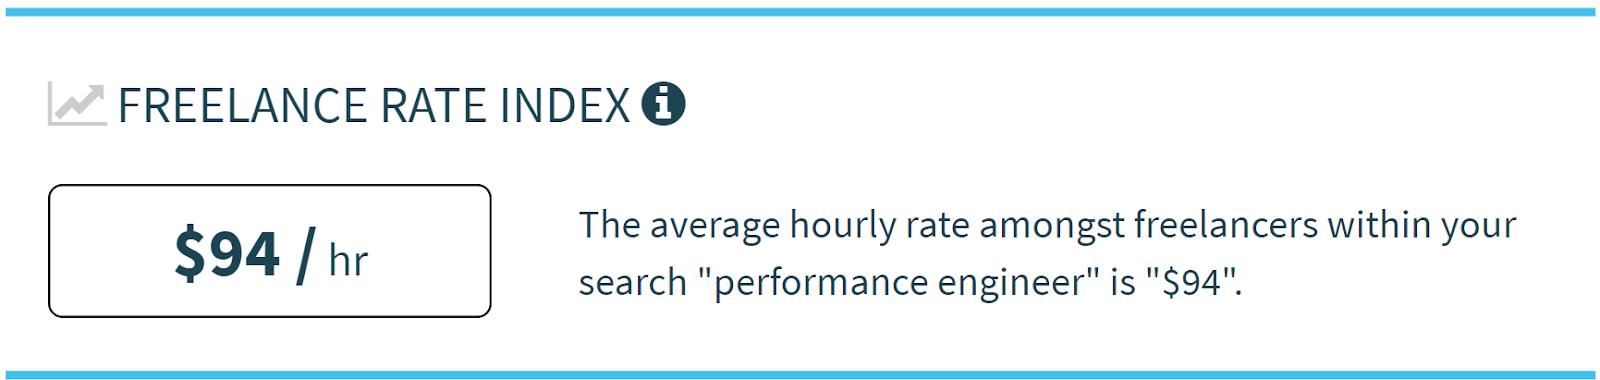 Performance Engineer - Average Freelance Rate